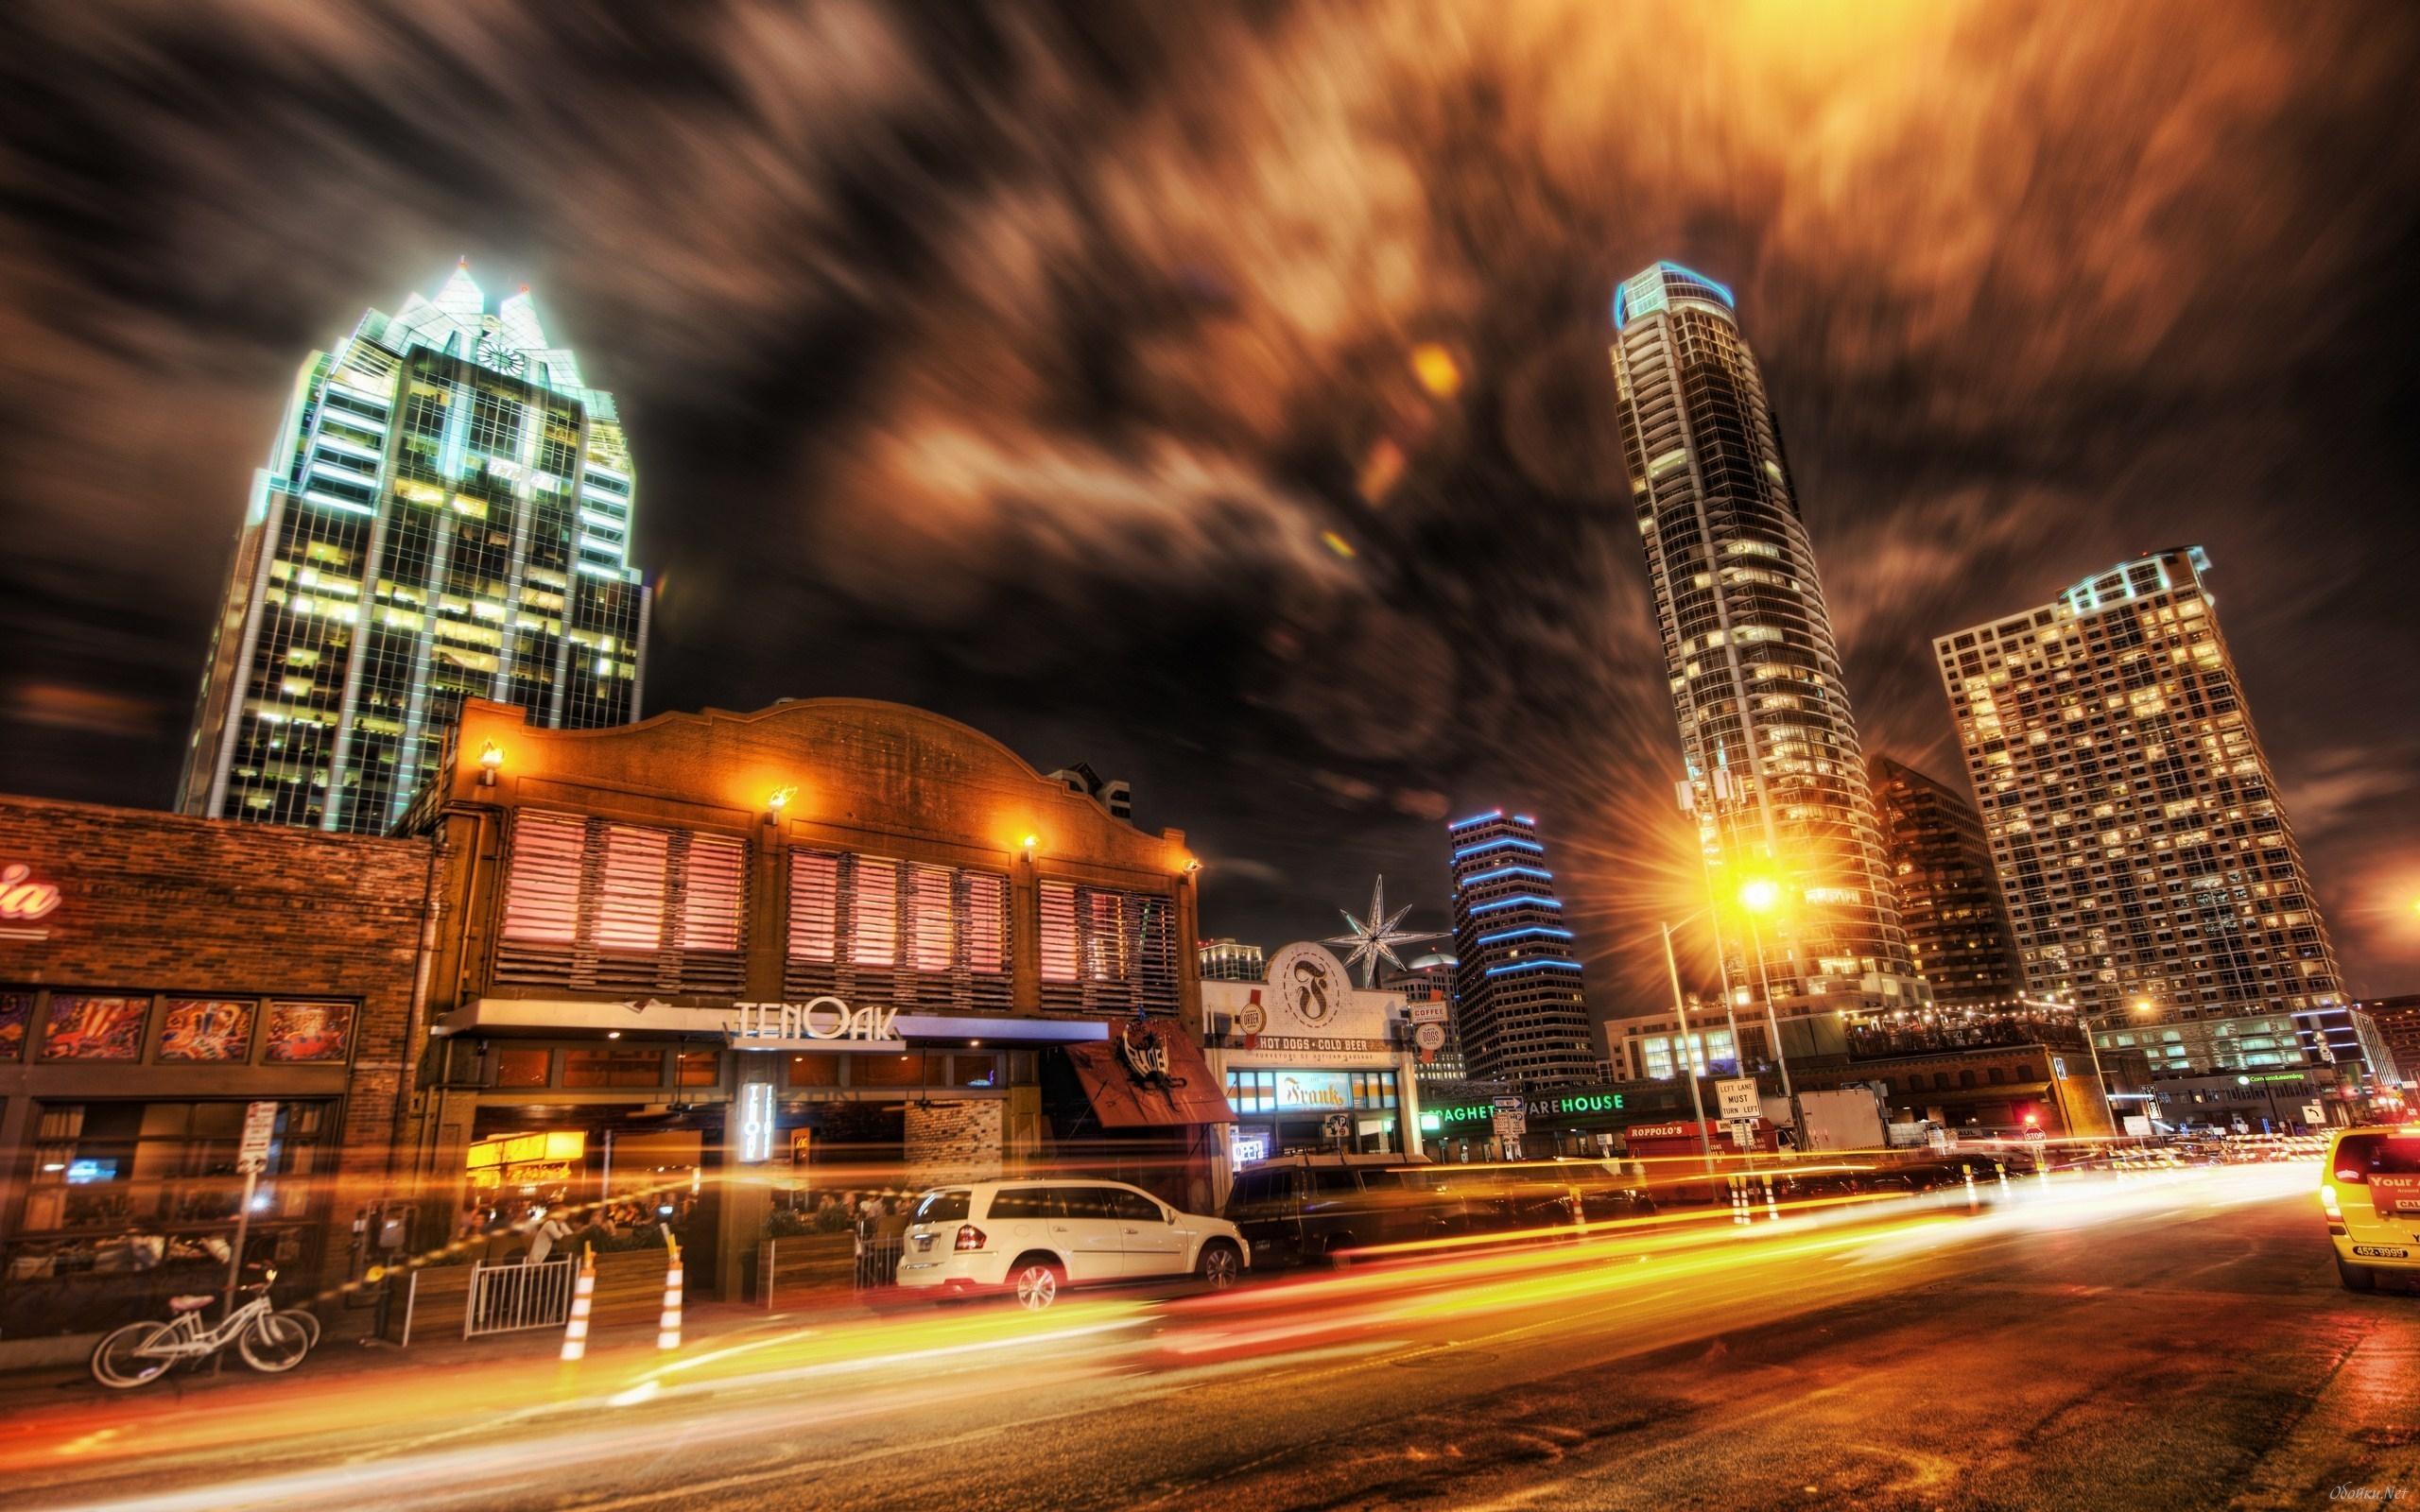 Ordinary night city street HD Desktop Wallpaper HD Desktop Wallpaper 2560x1600